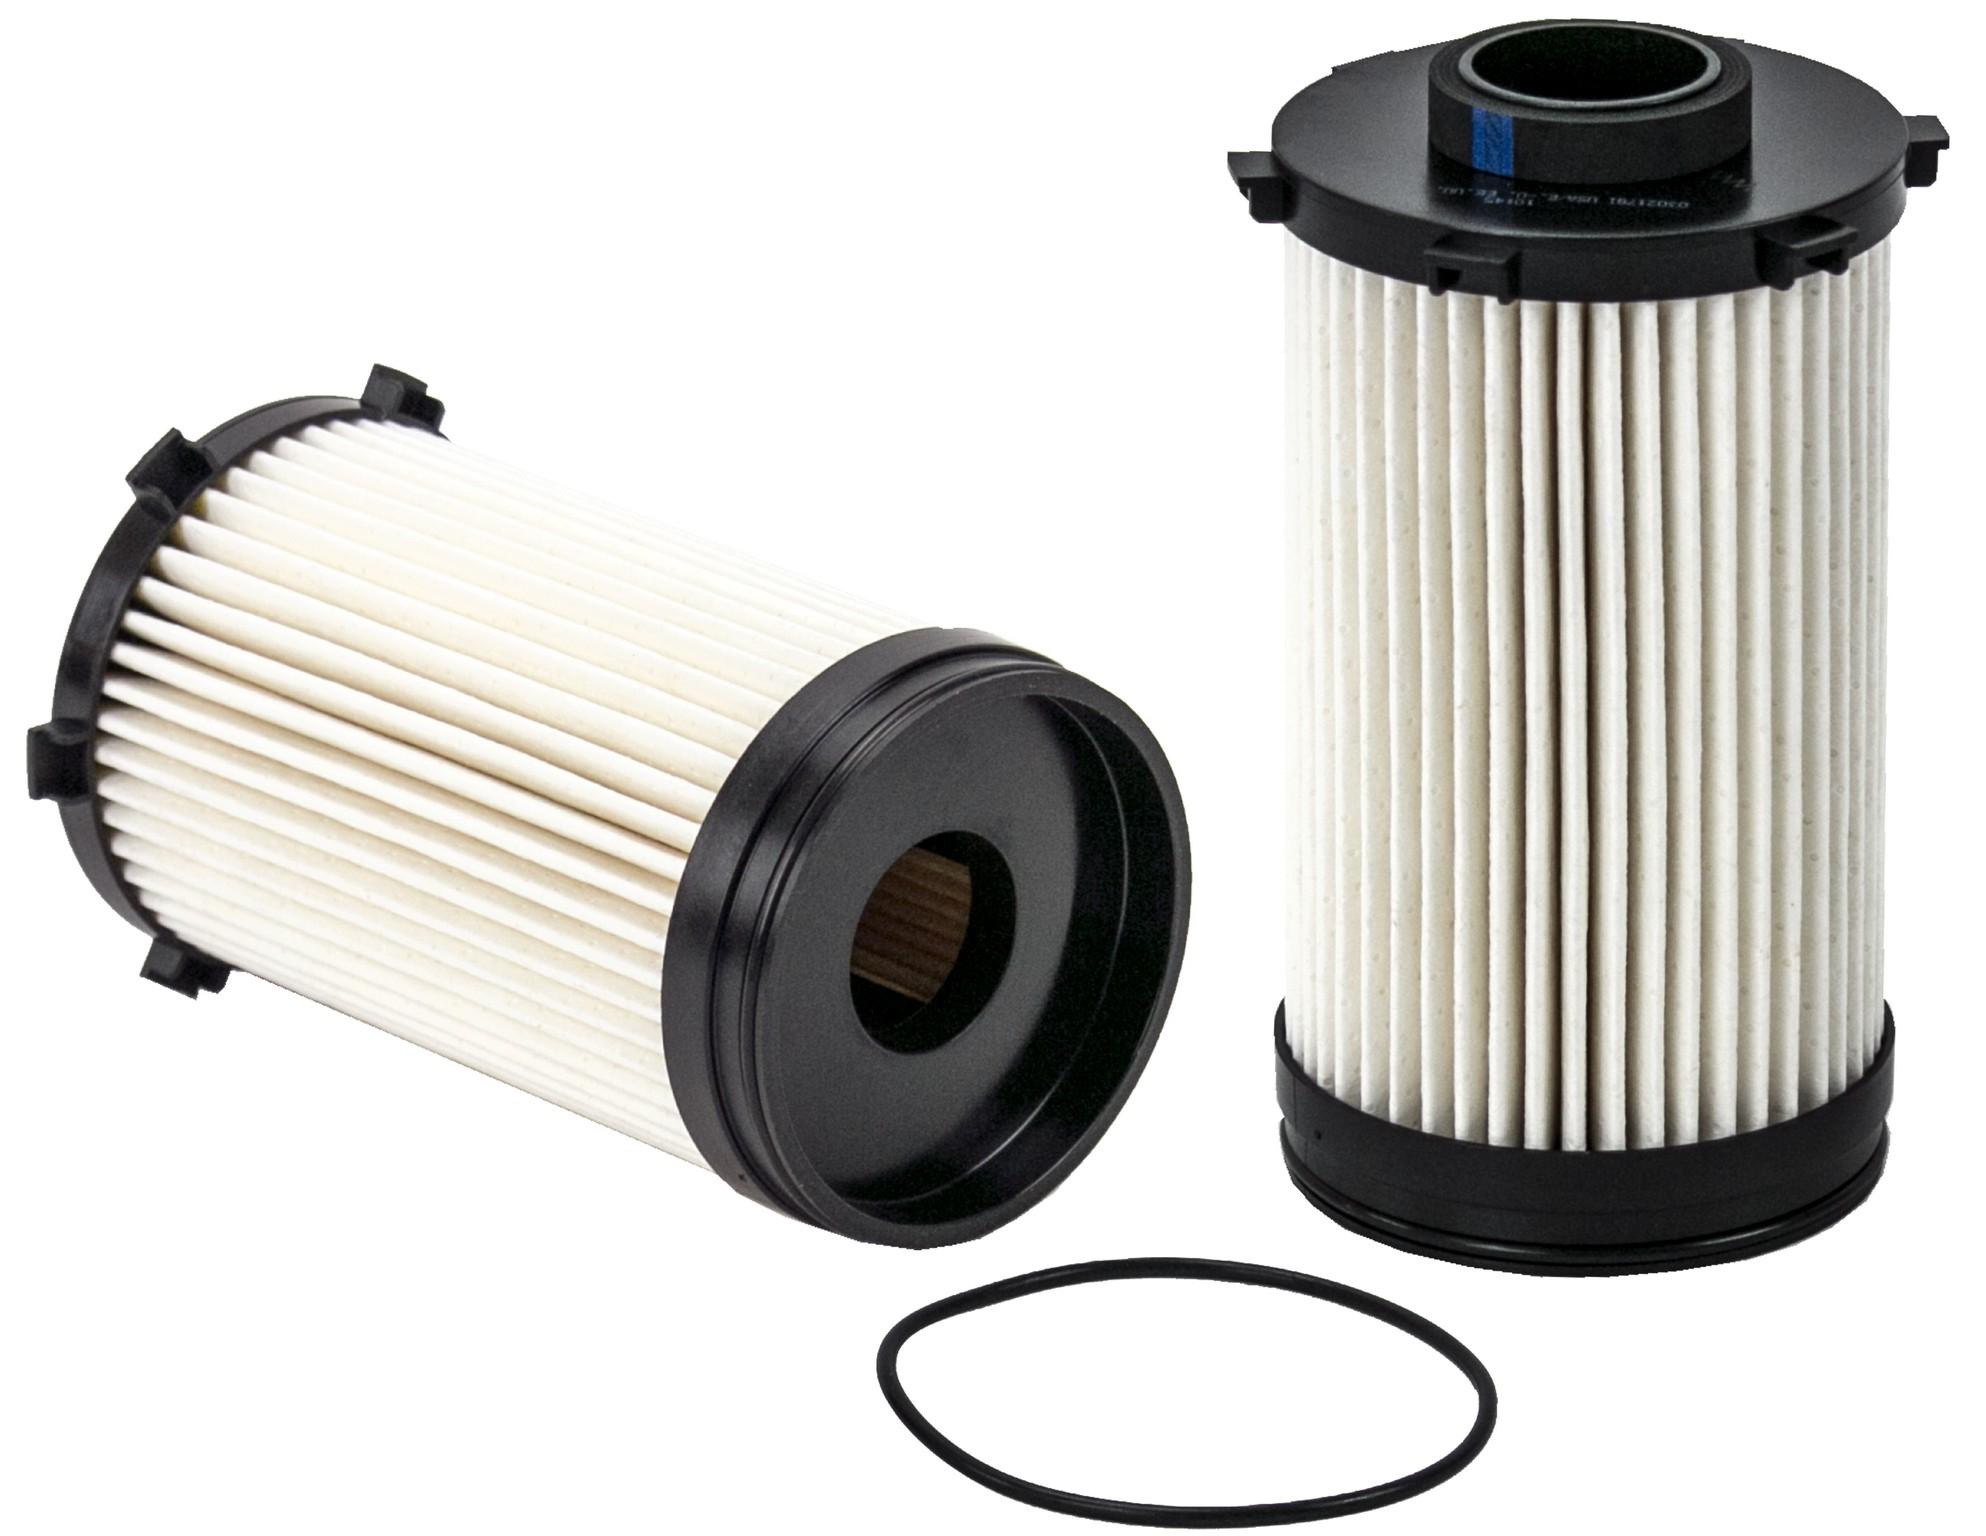 hight resolution of 2007 dodge ram 2500 fuel filter wf 33733